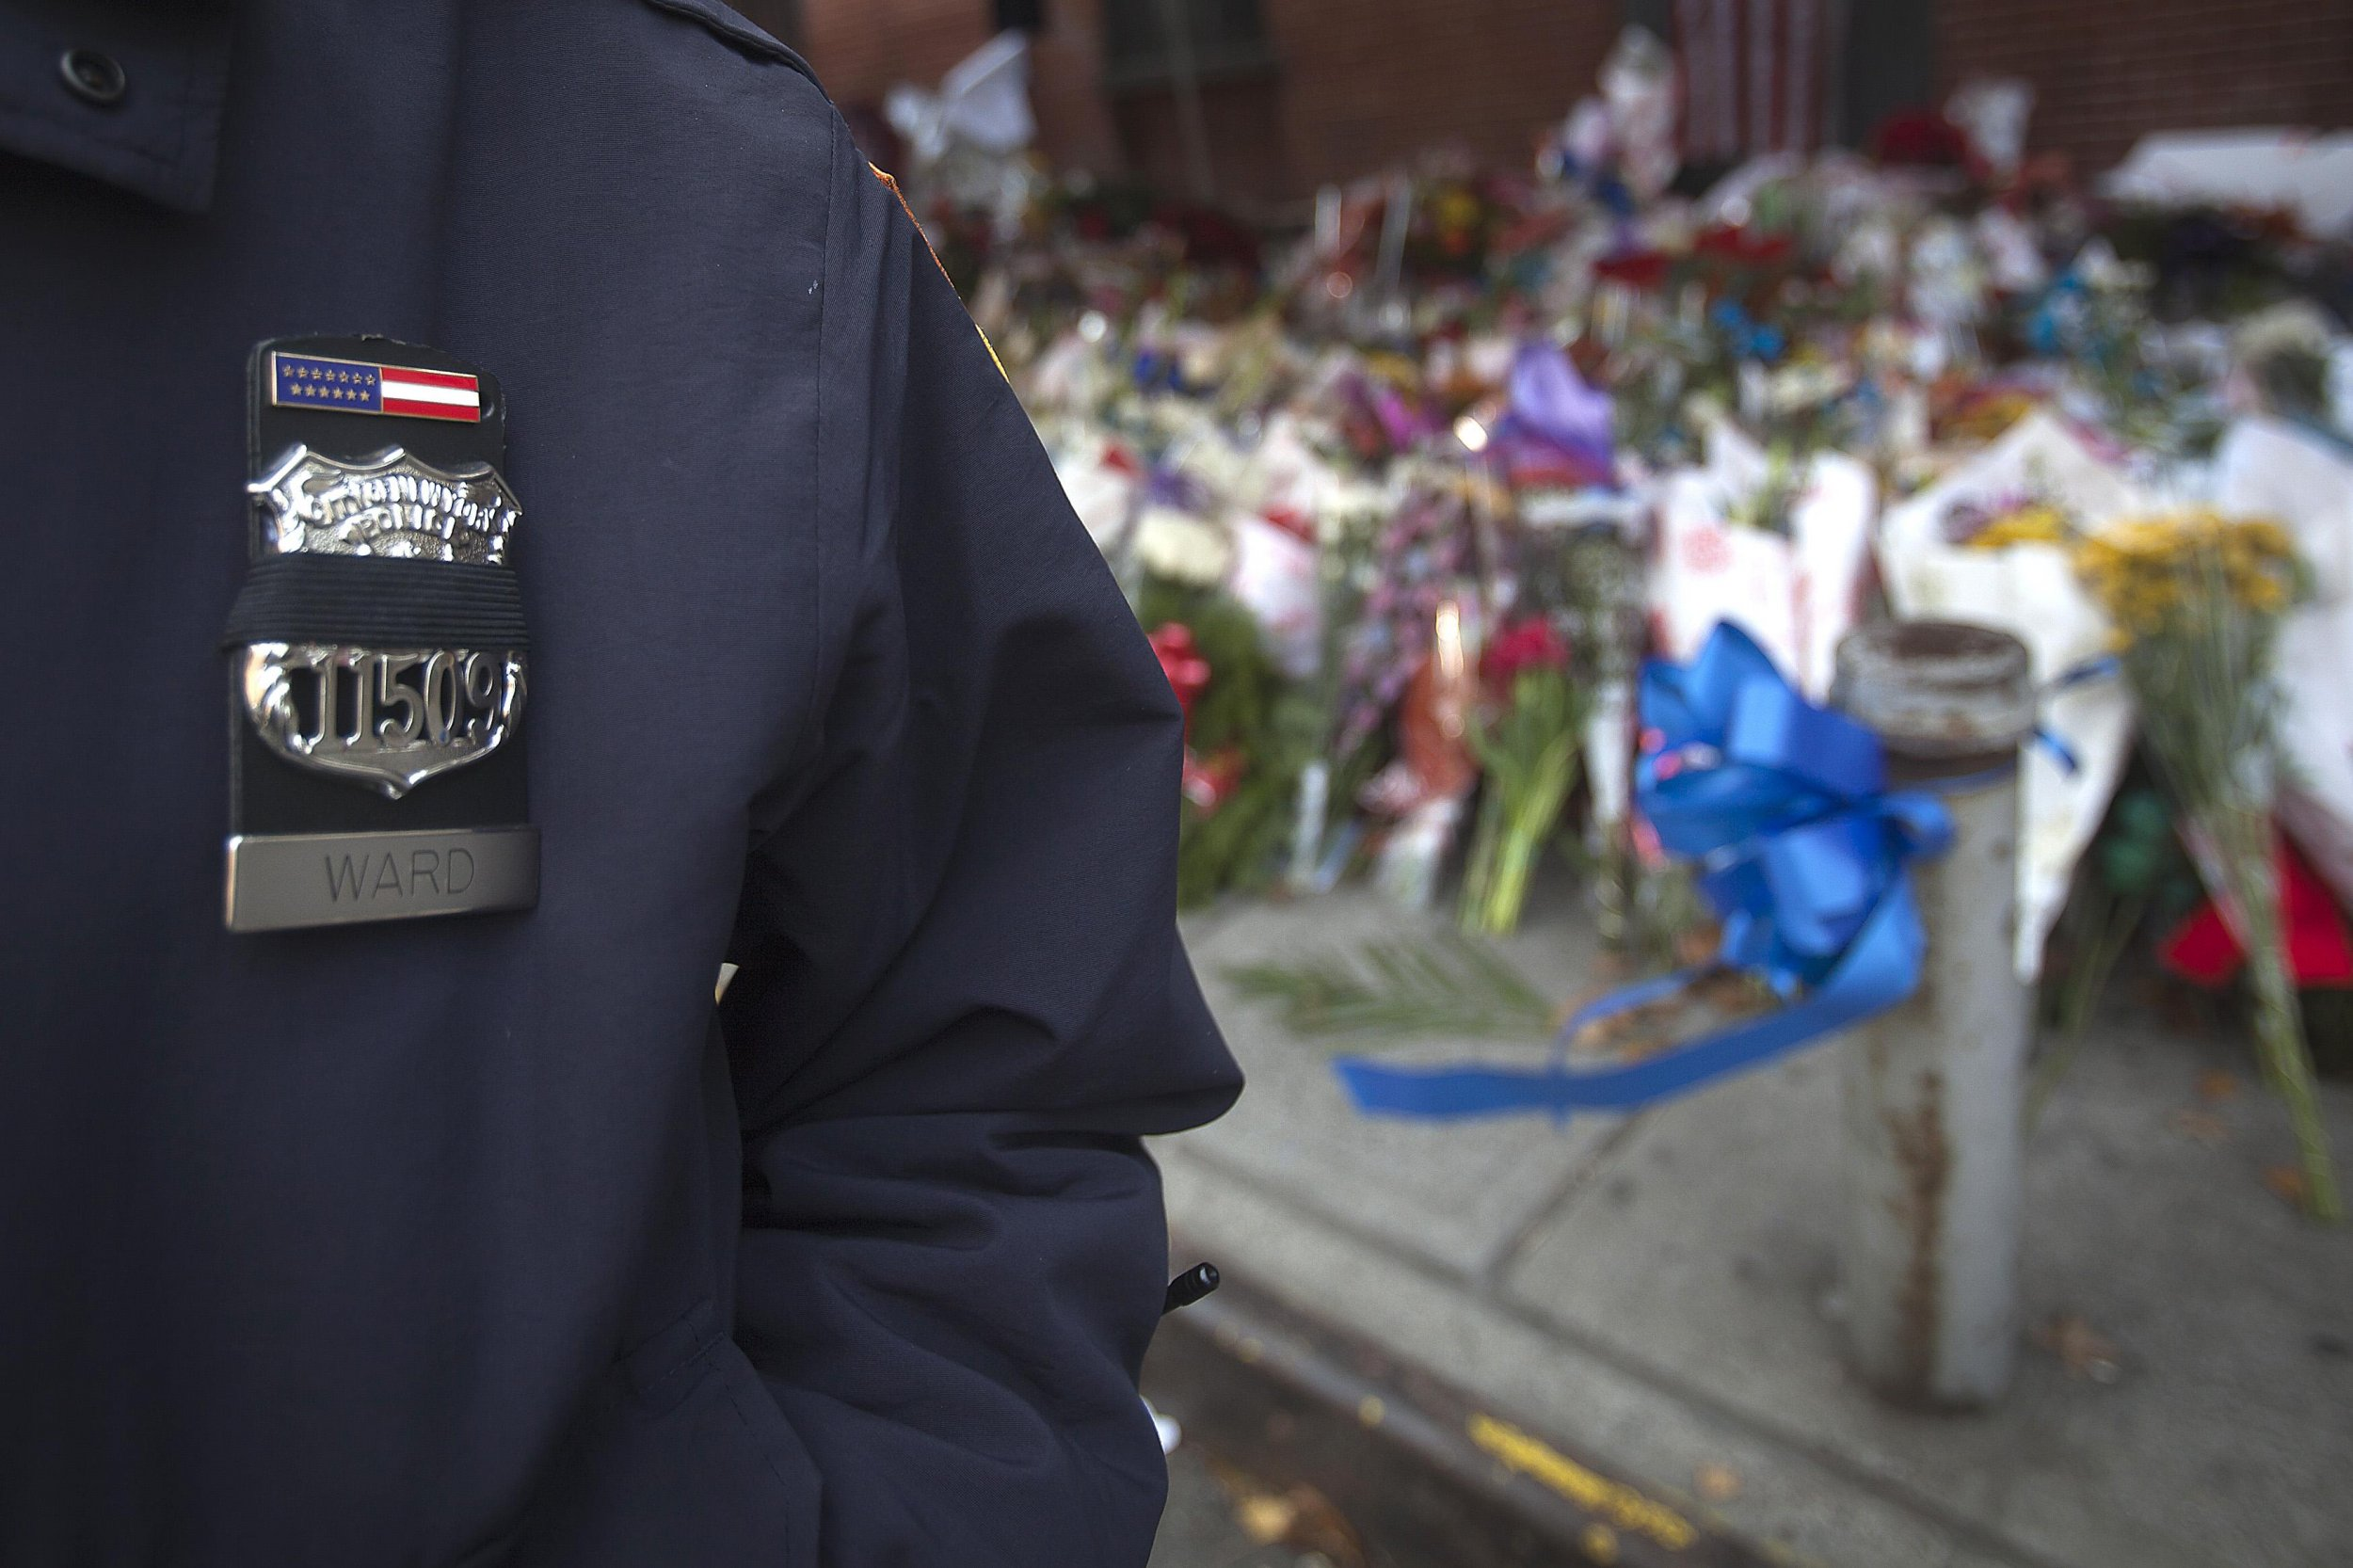 2014-12-25T223628Z_1382581327_GM1EACQ0I5T01_RTRMADP_3_USA-NEWYORK-POLICE